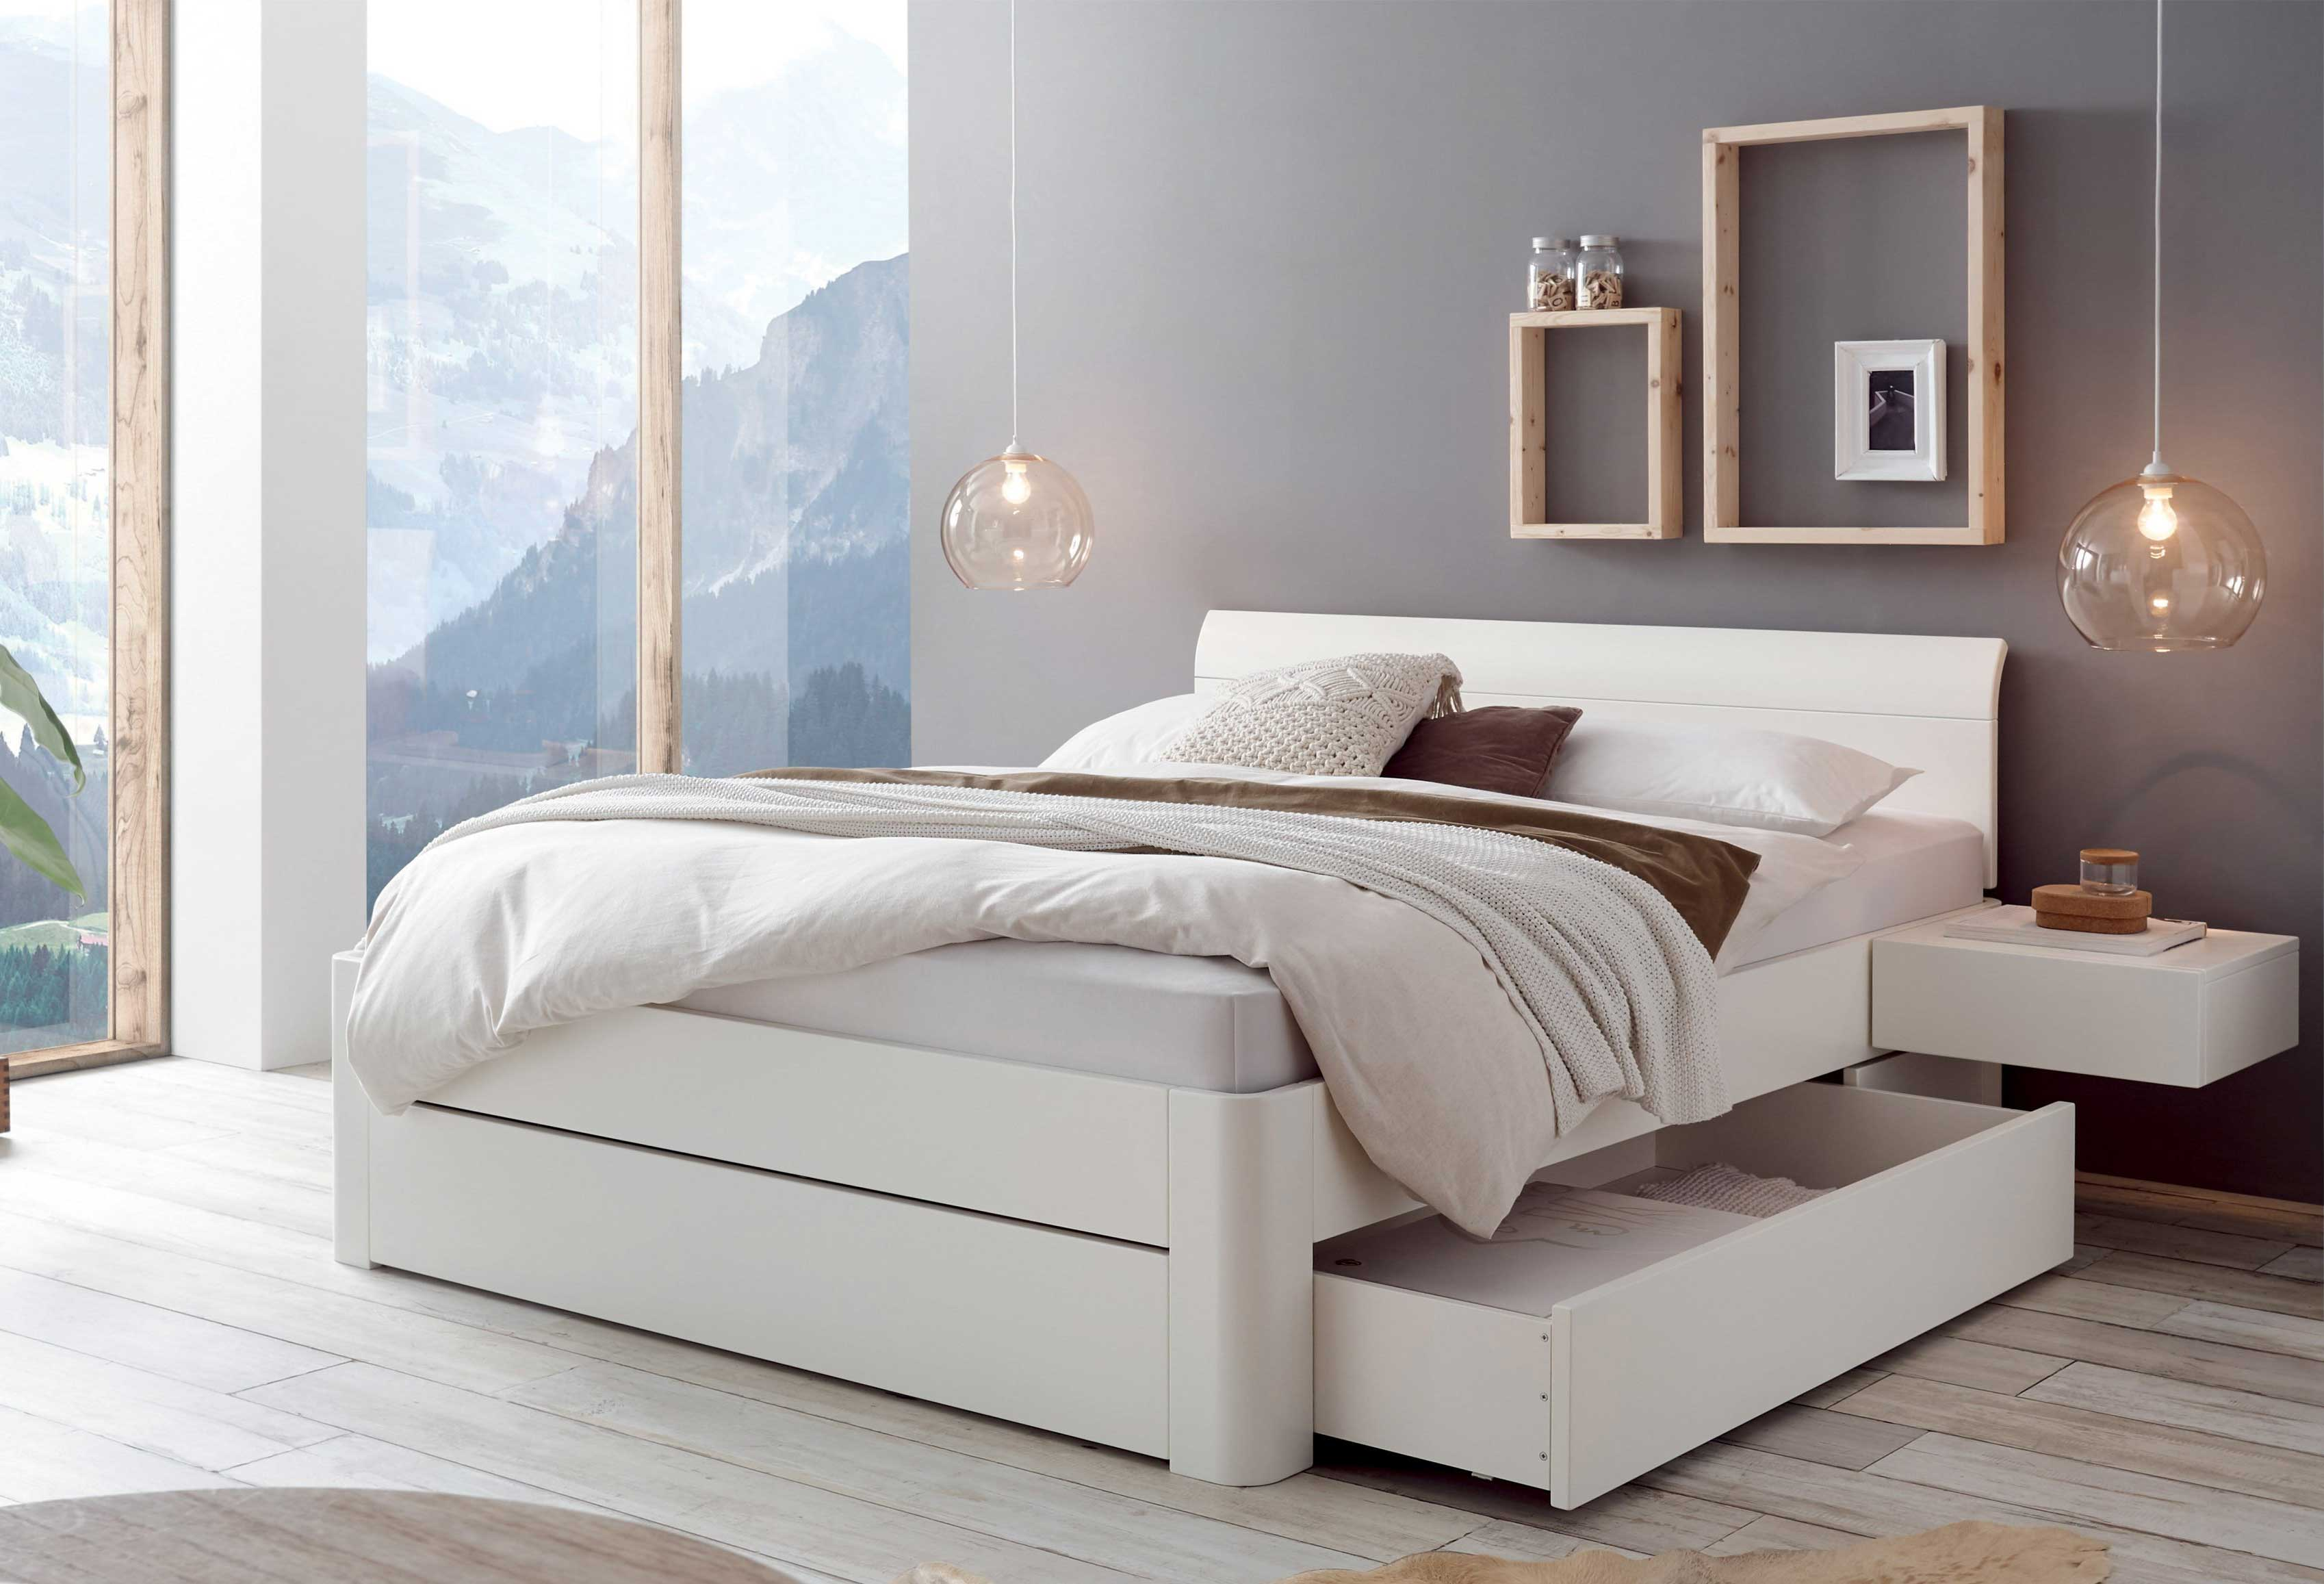 Massivholzbett Bellissimo weiß mit Bettkasten